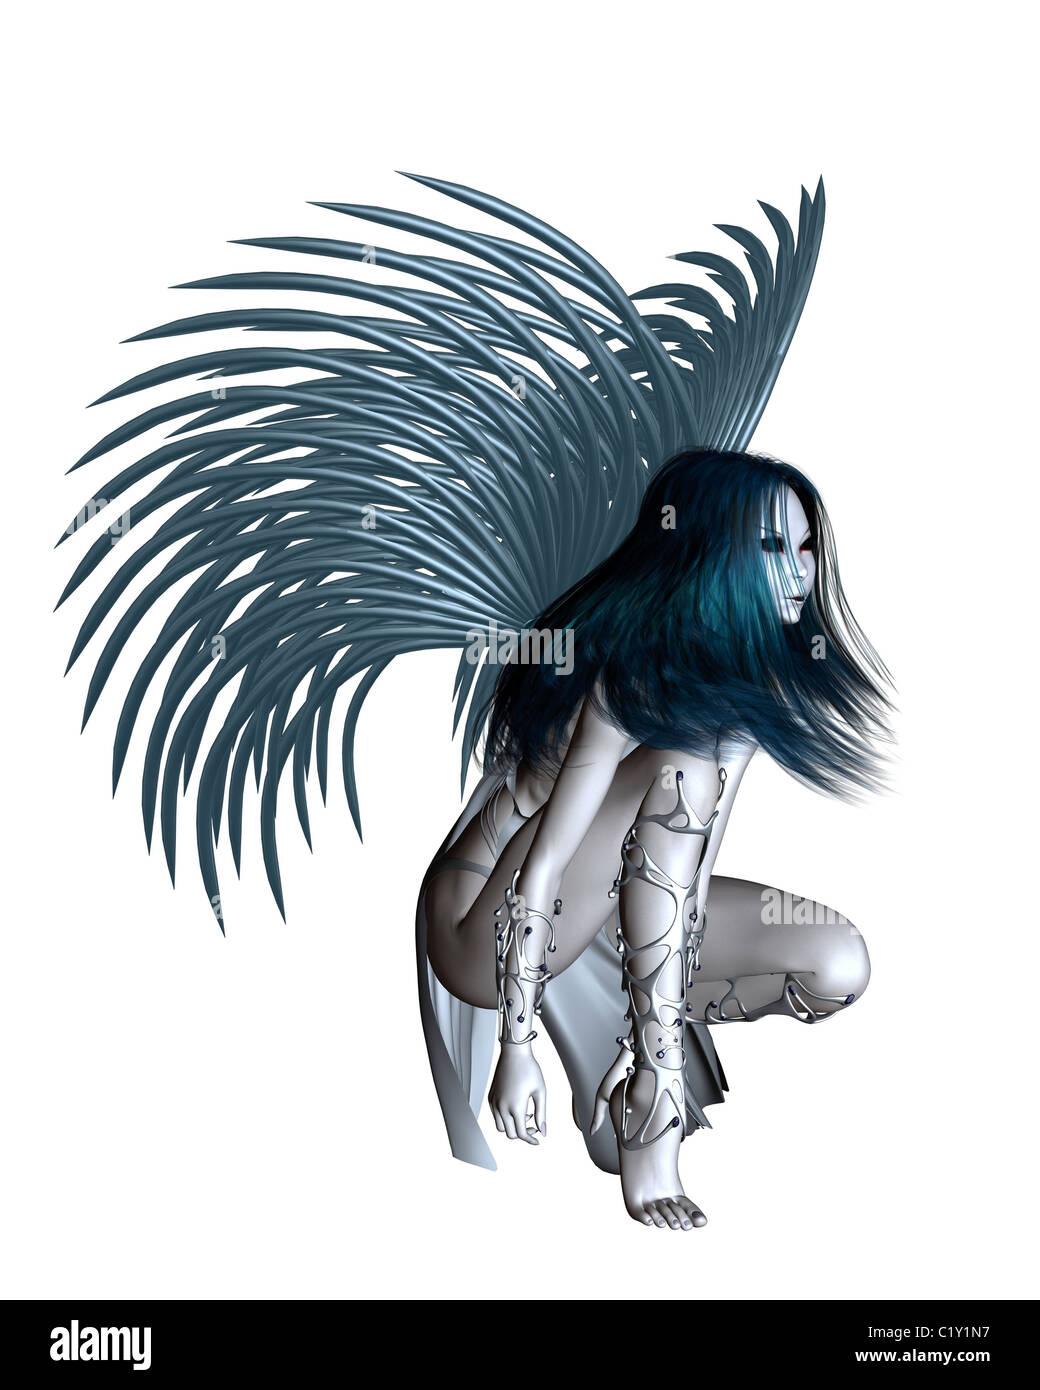 Alien Angel - 2 - Stock Image